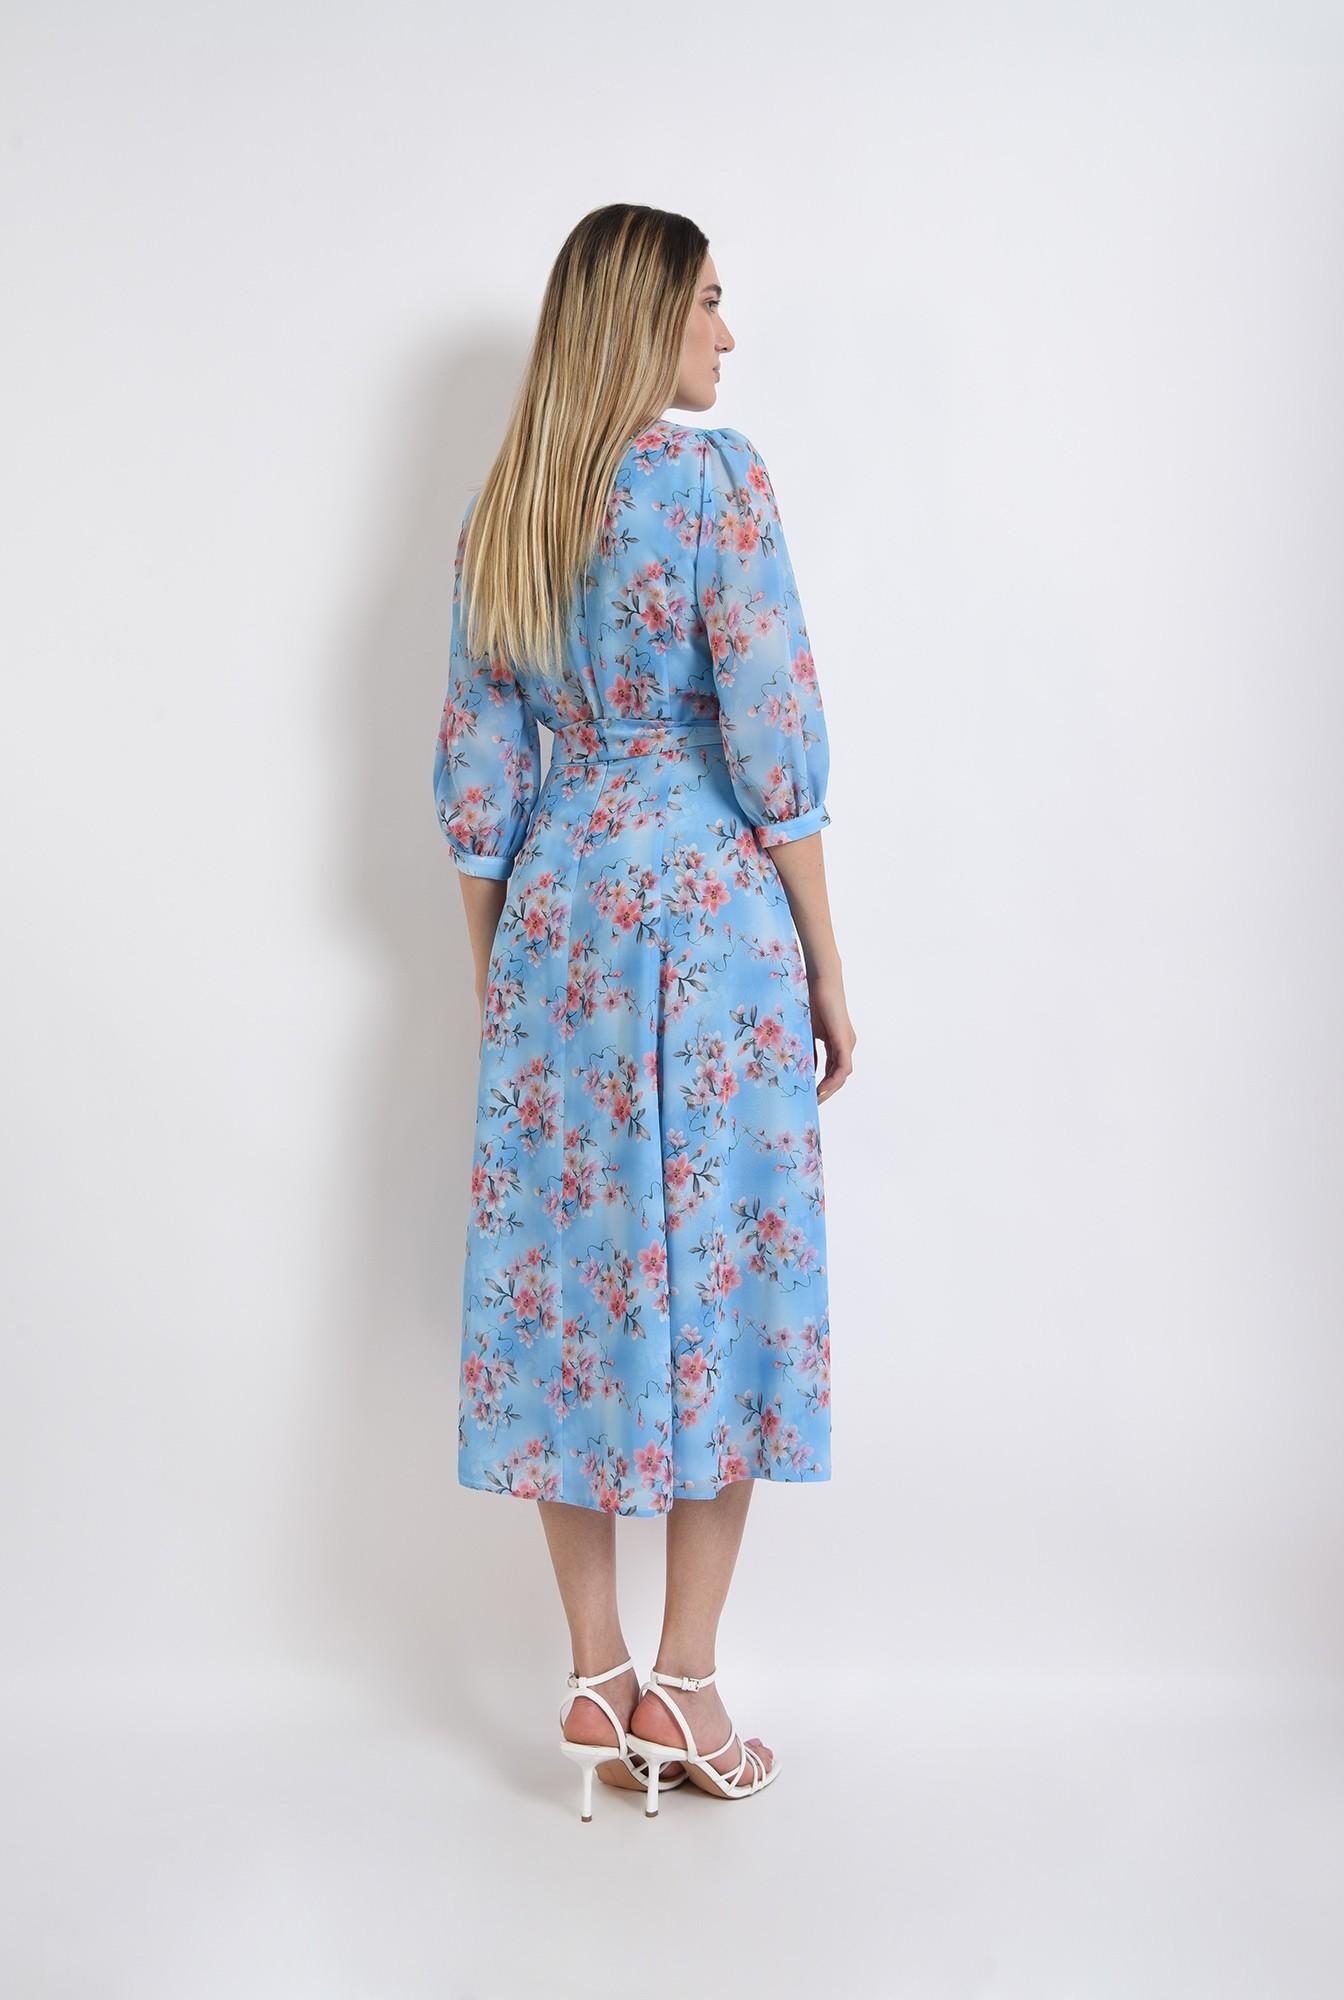 1 - rochie eleganta, poema, bleu, cu flori, midi